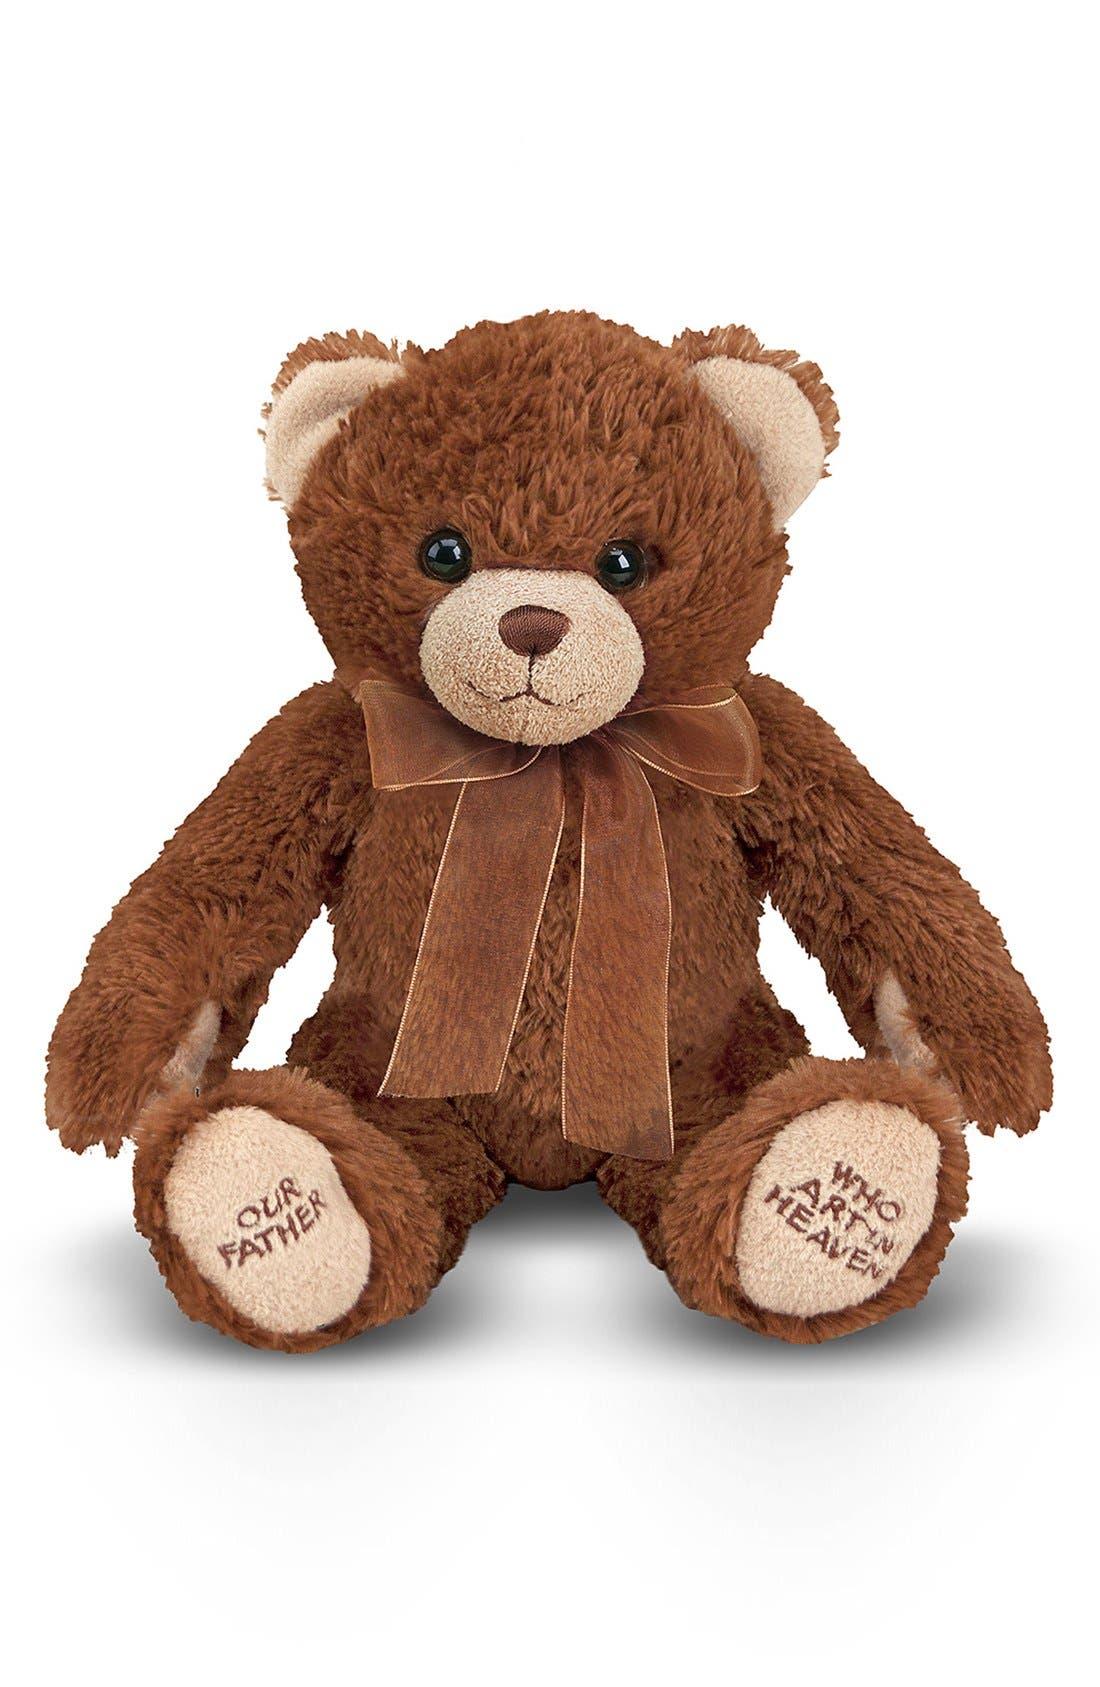 Melissa & Doug Lord's Prayer Bear Stuffed Animal